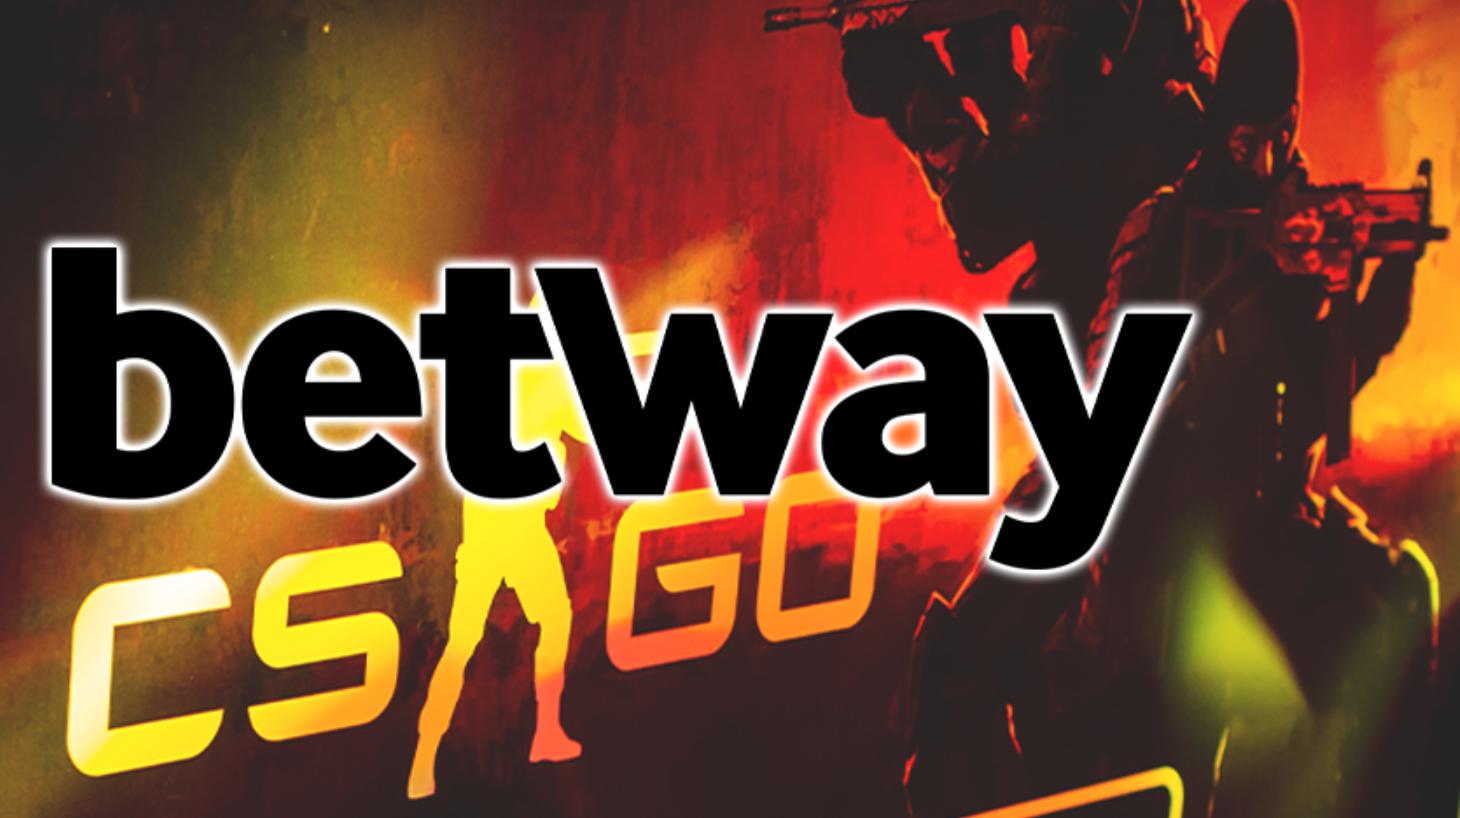 Detalles de Betway España